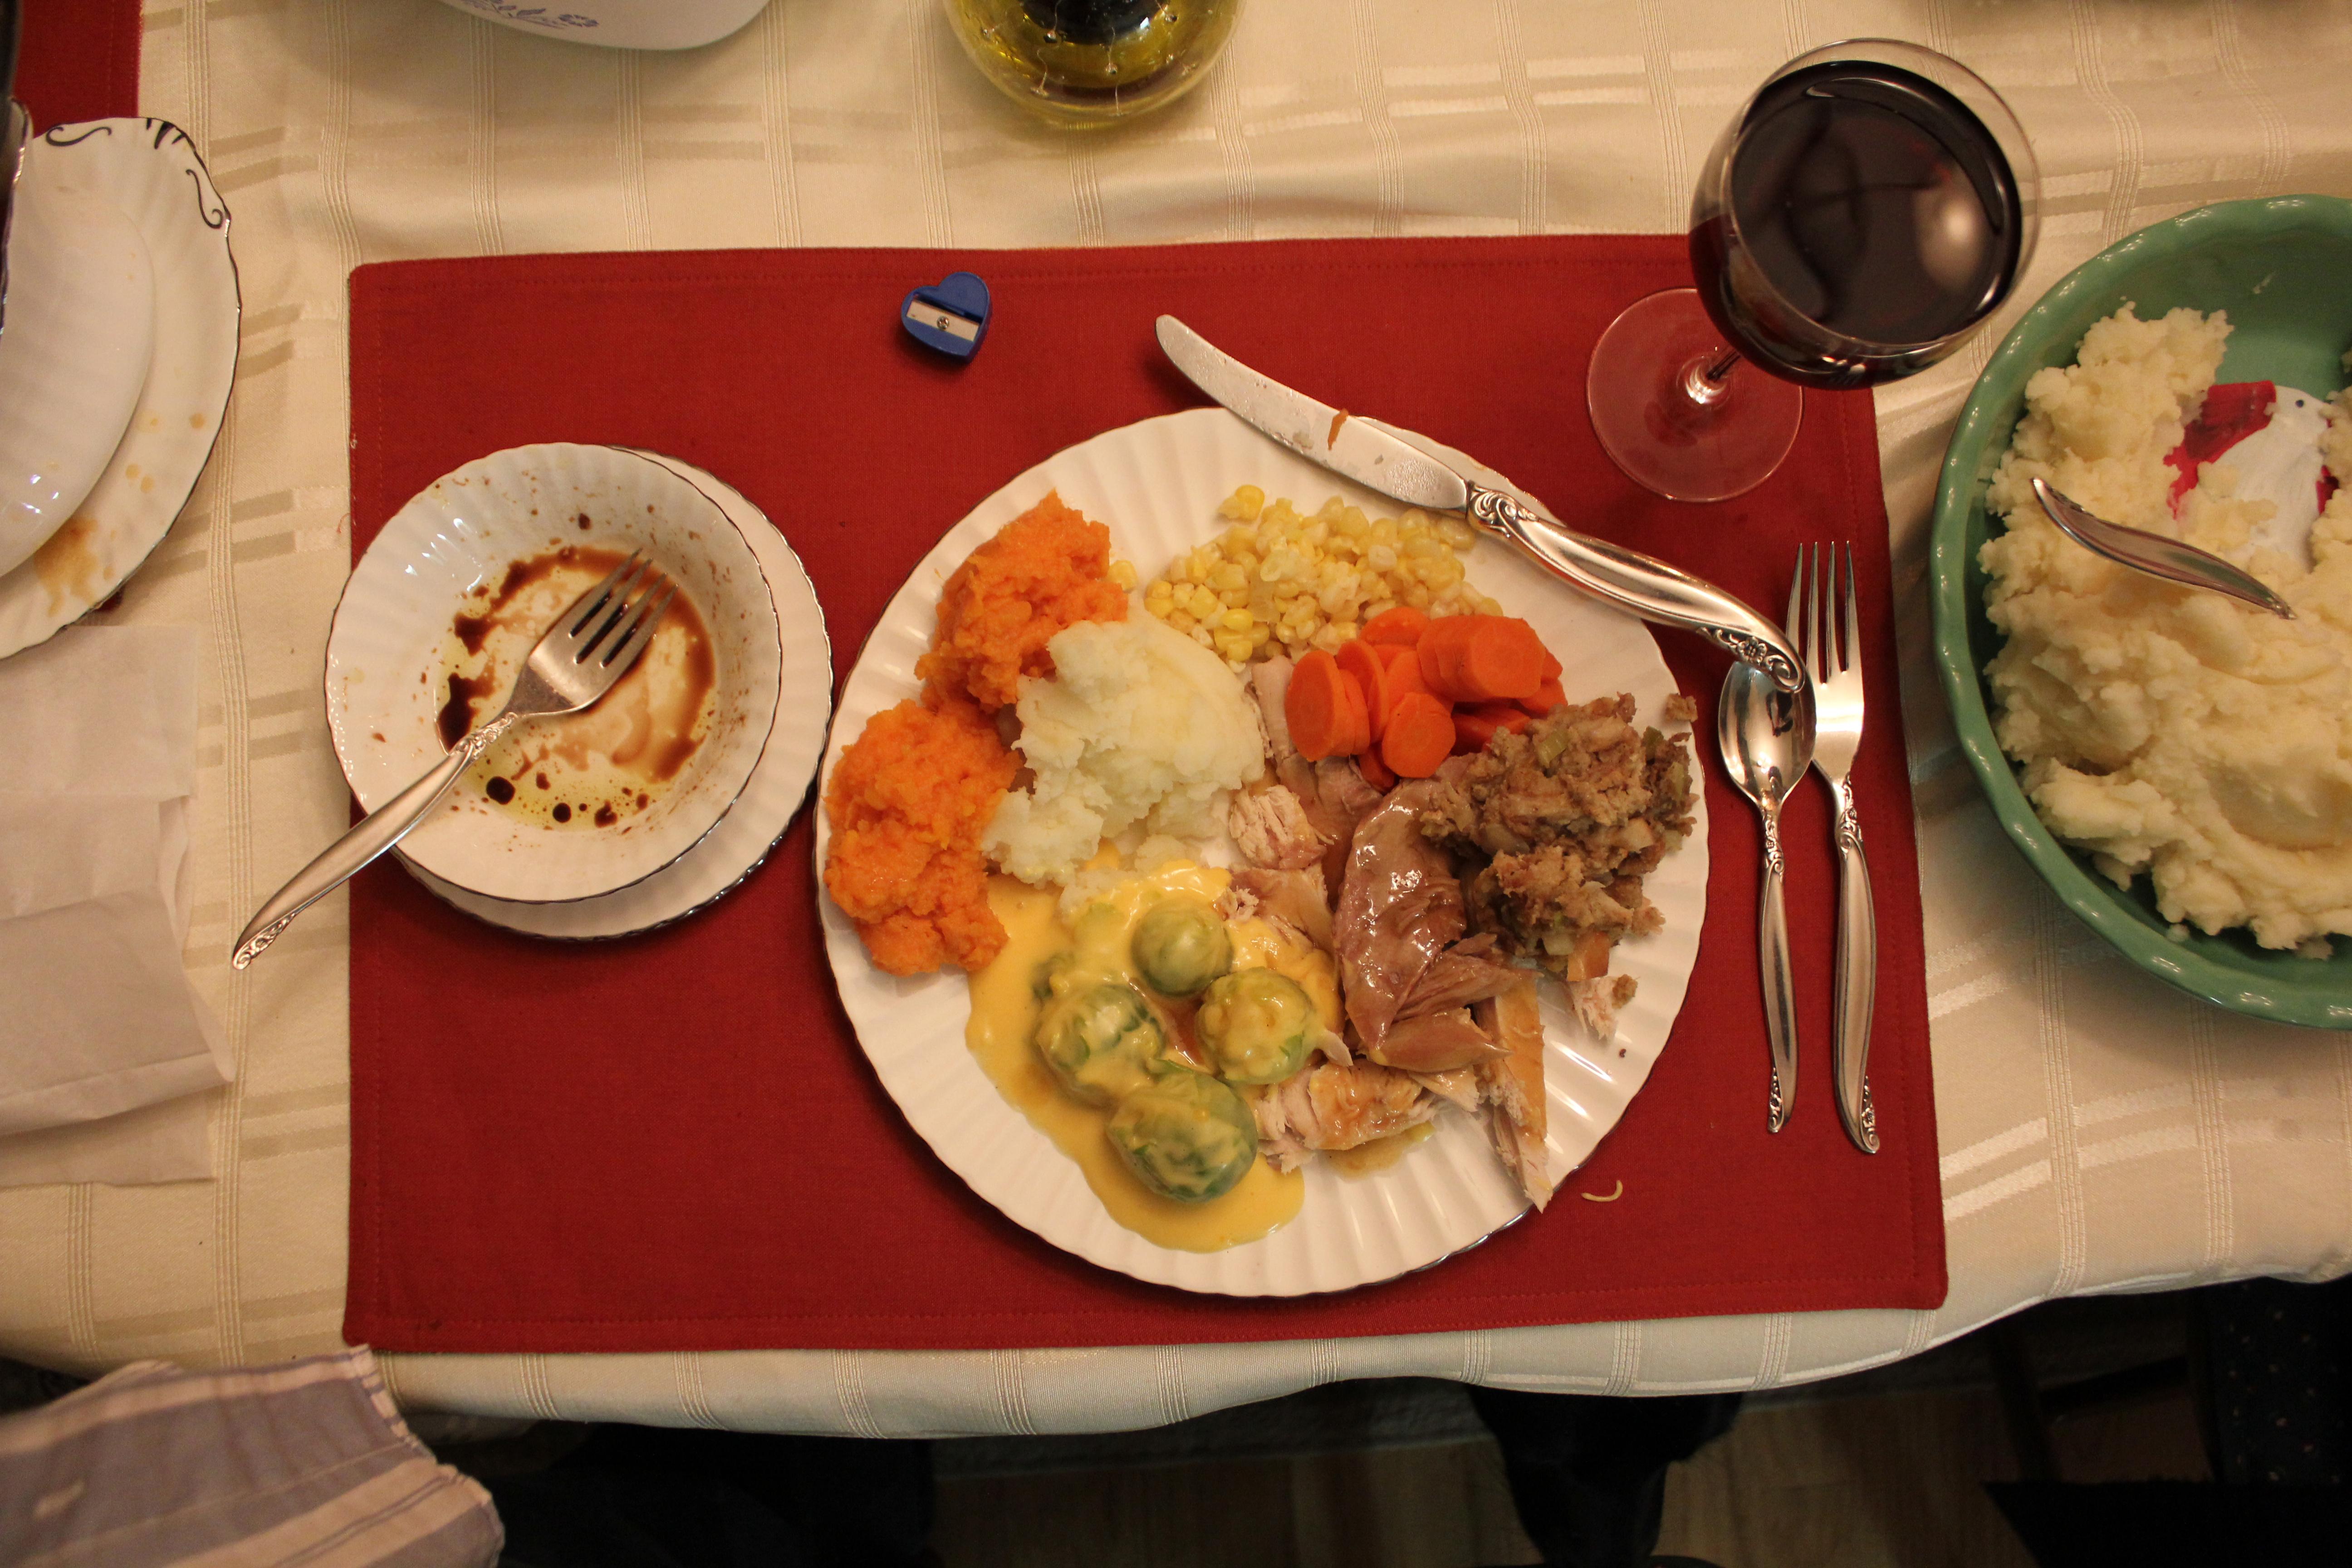 filechristmas dinner 2010 img 0329jpg